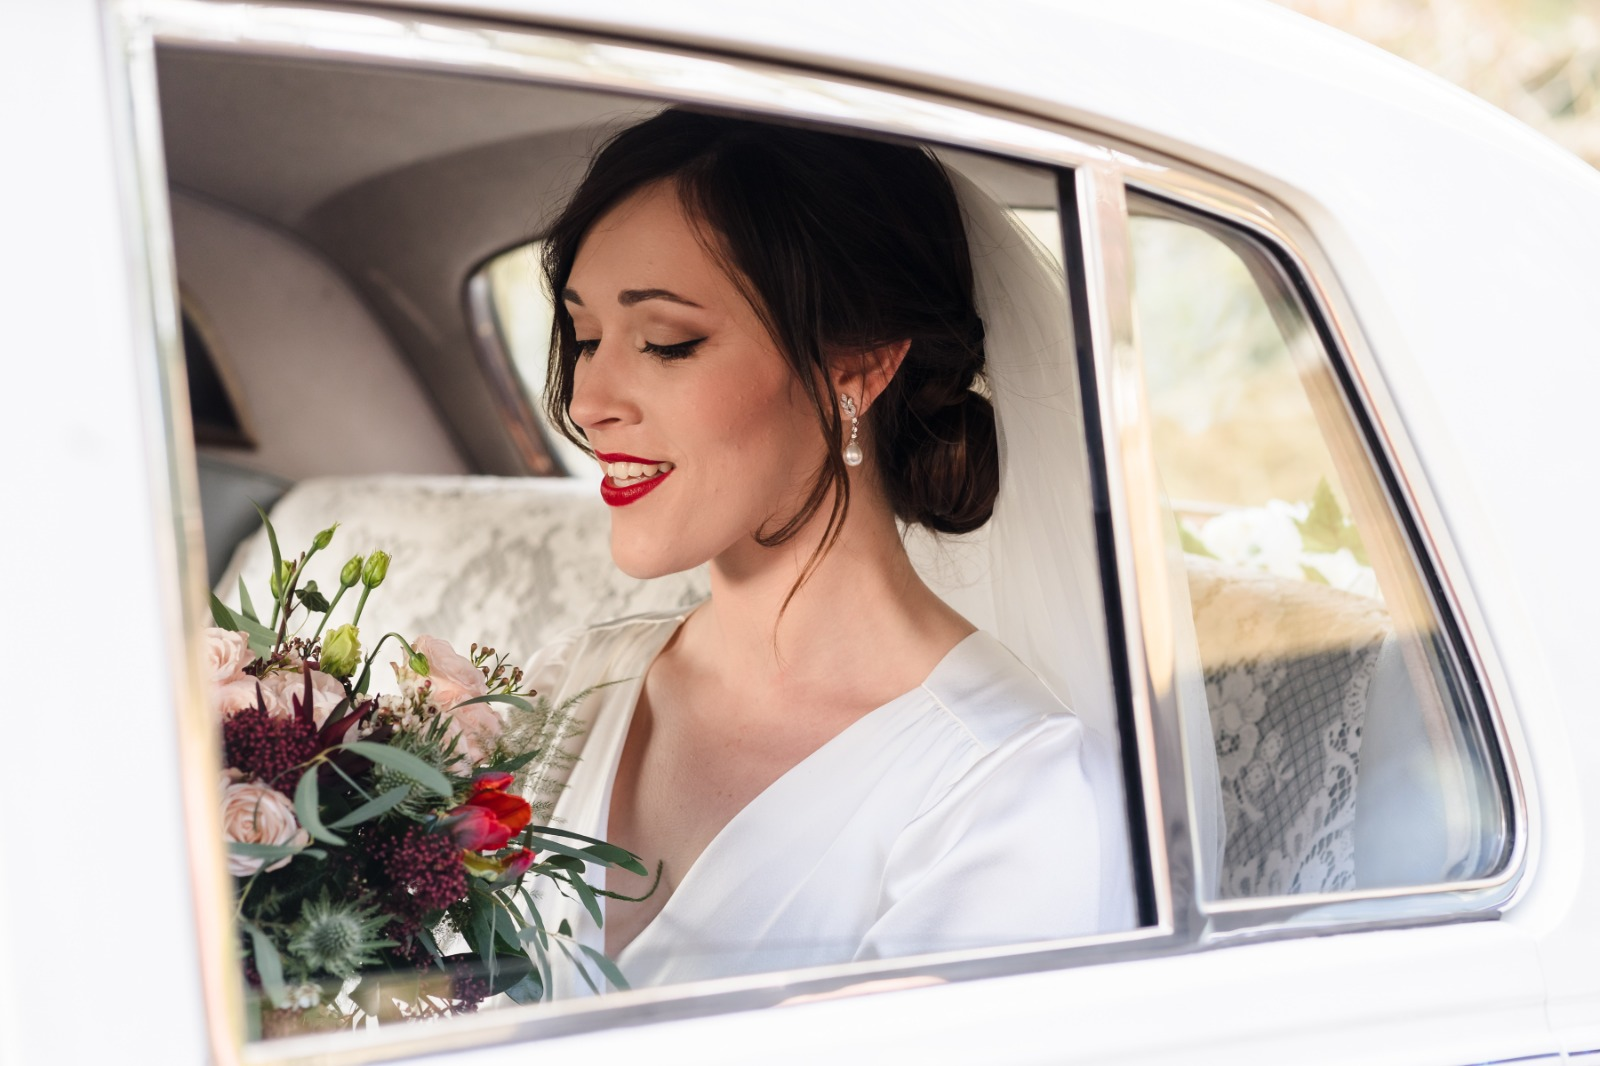 Sophie wearing 1940s style vintage wedding dress